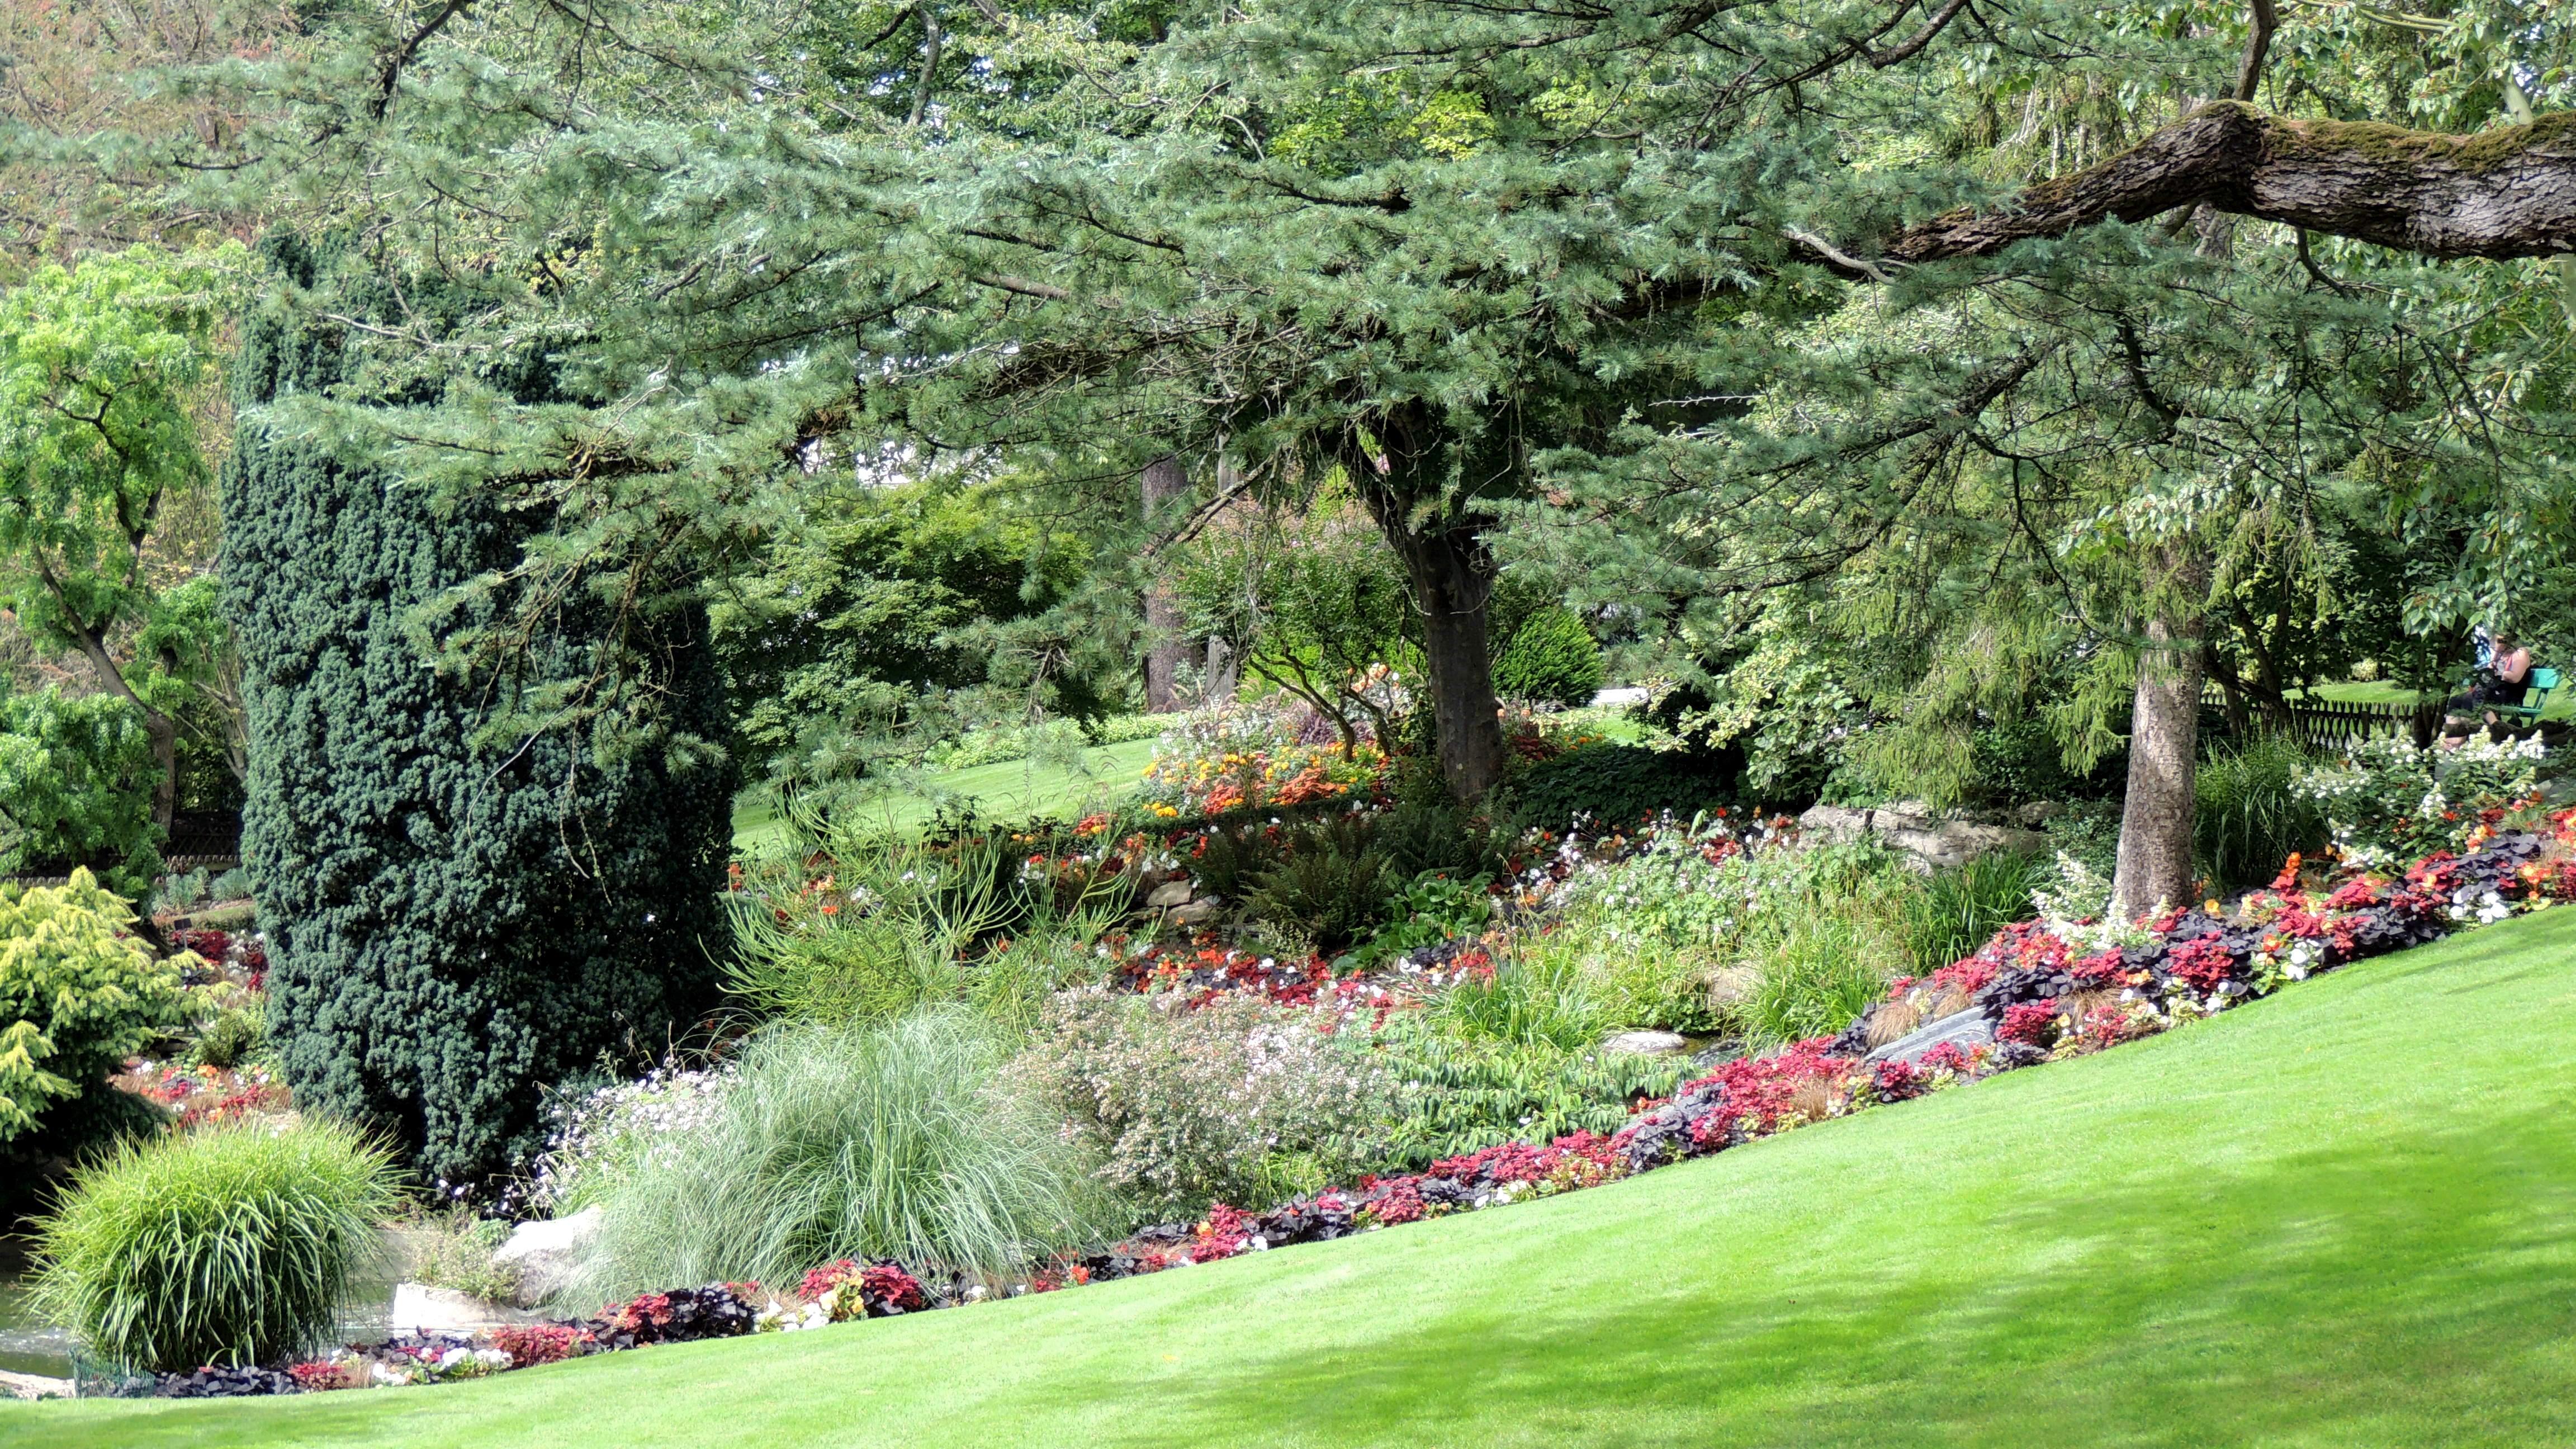 File 2013 08 13 161618 Jardin Des Plantes D Angers Jpg Wikimedia Commons